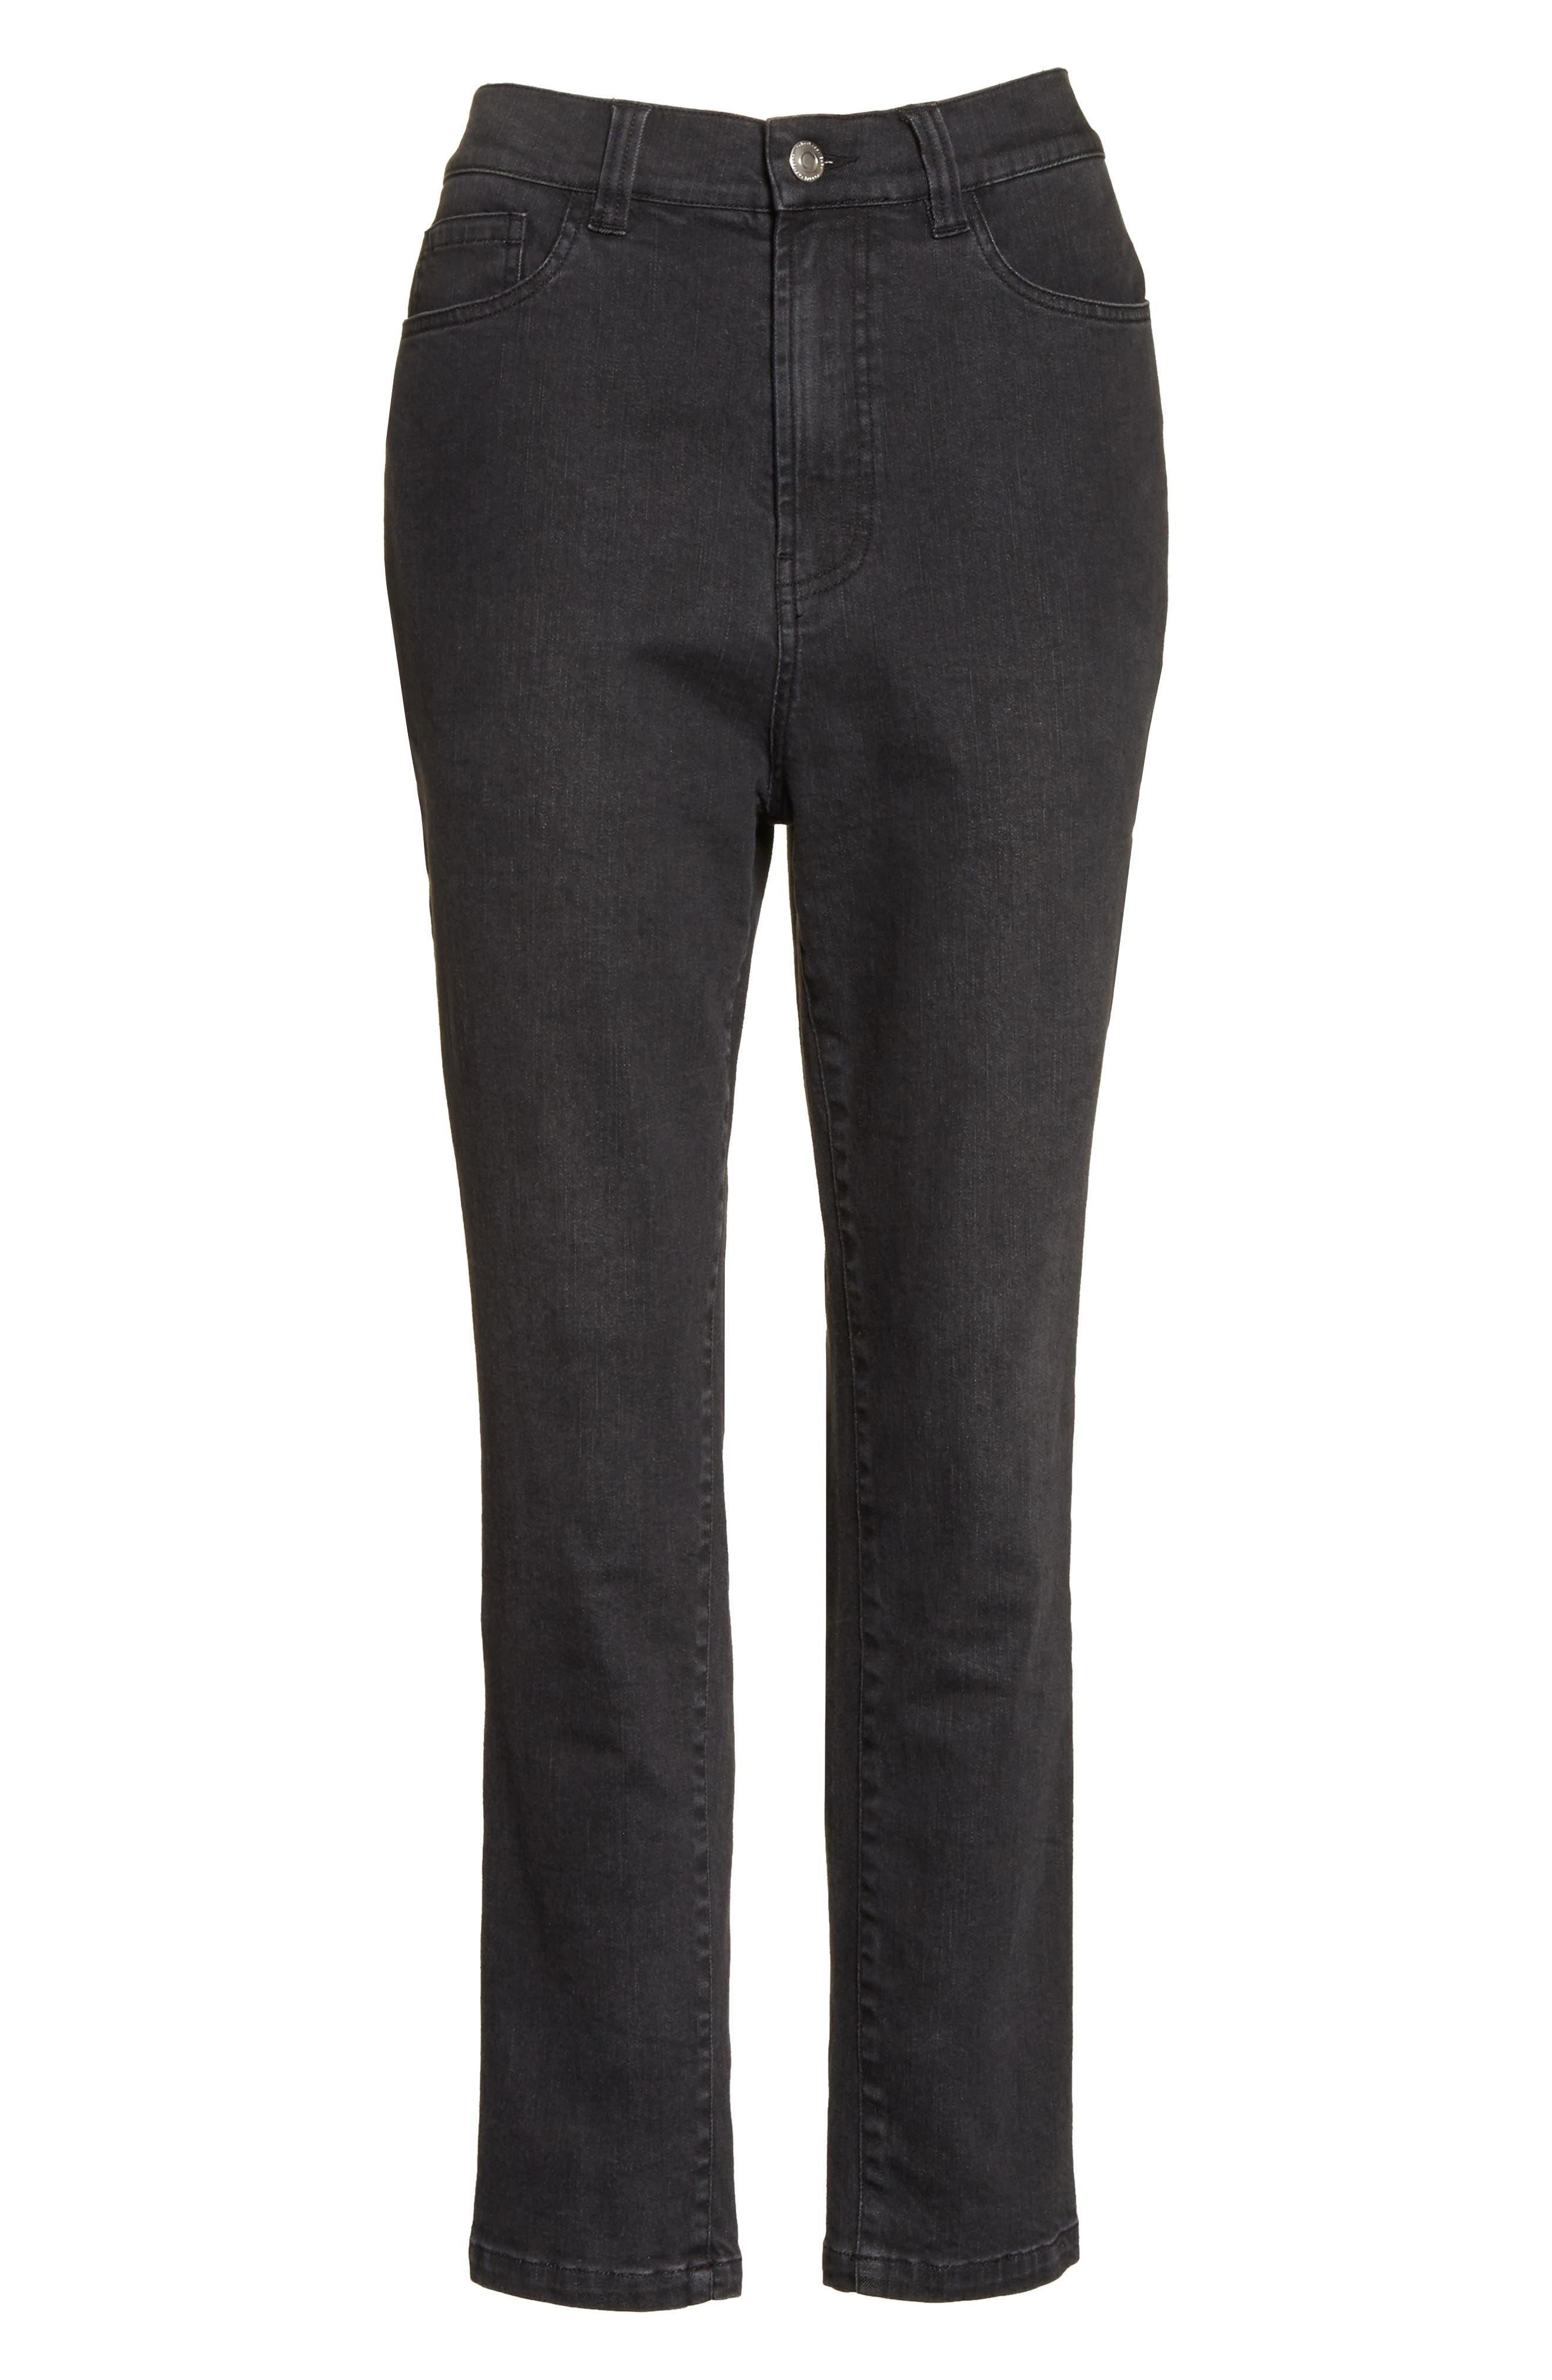 High Waist Slim Jeans,                             Alternate thumbnail 7, color,                             Black Rinse